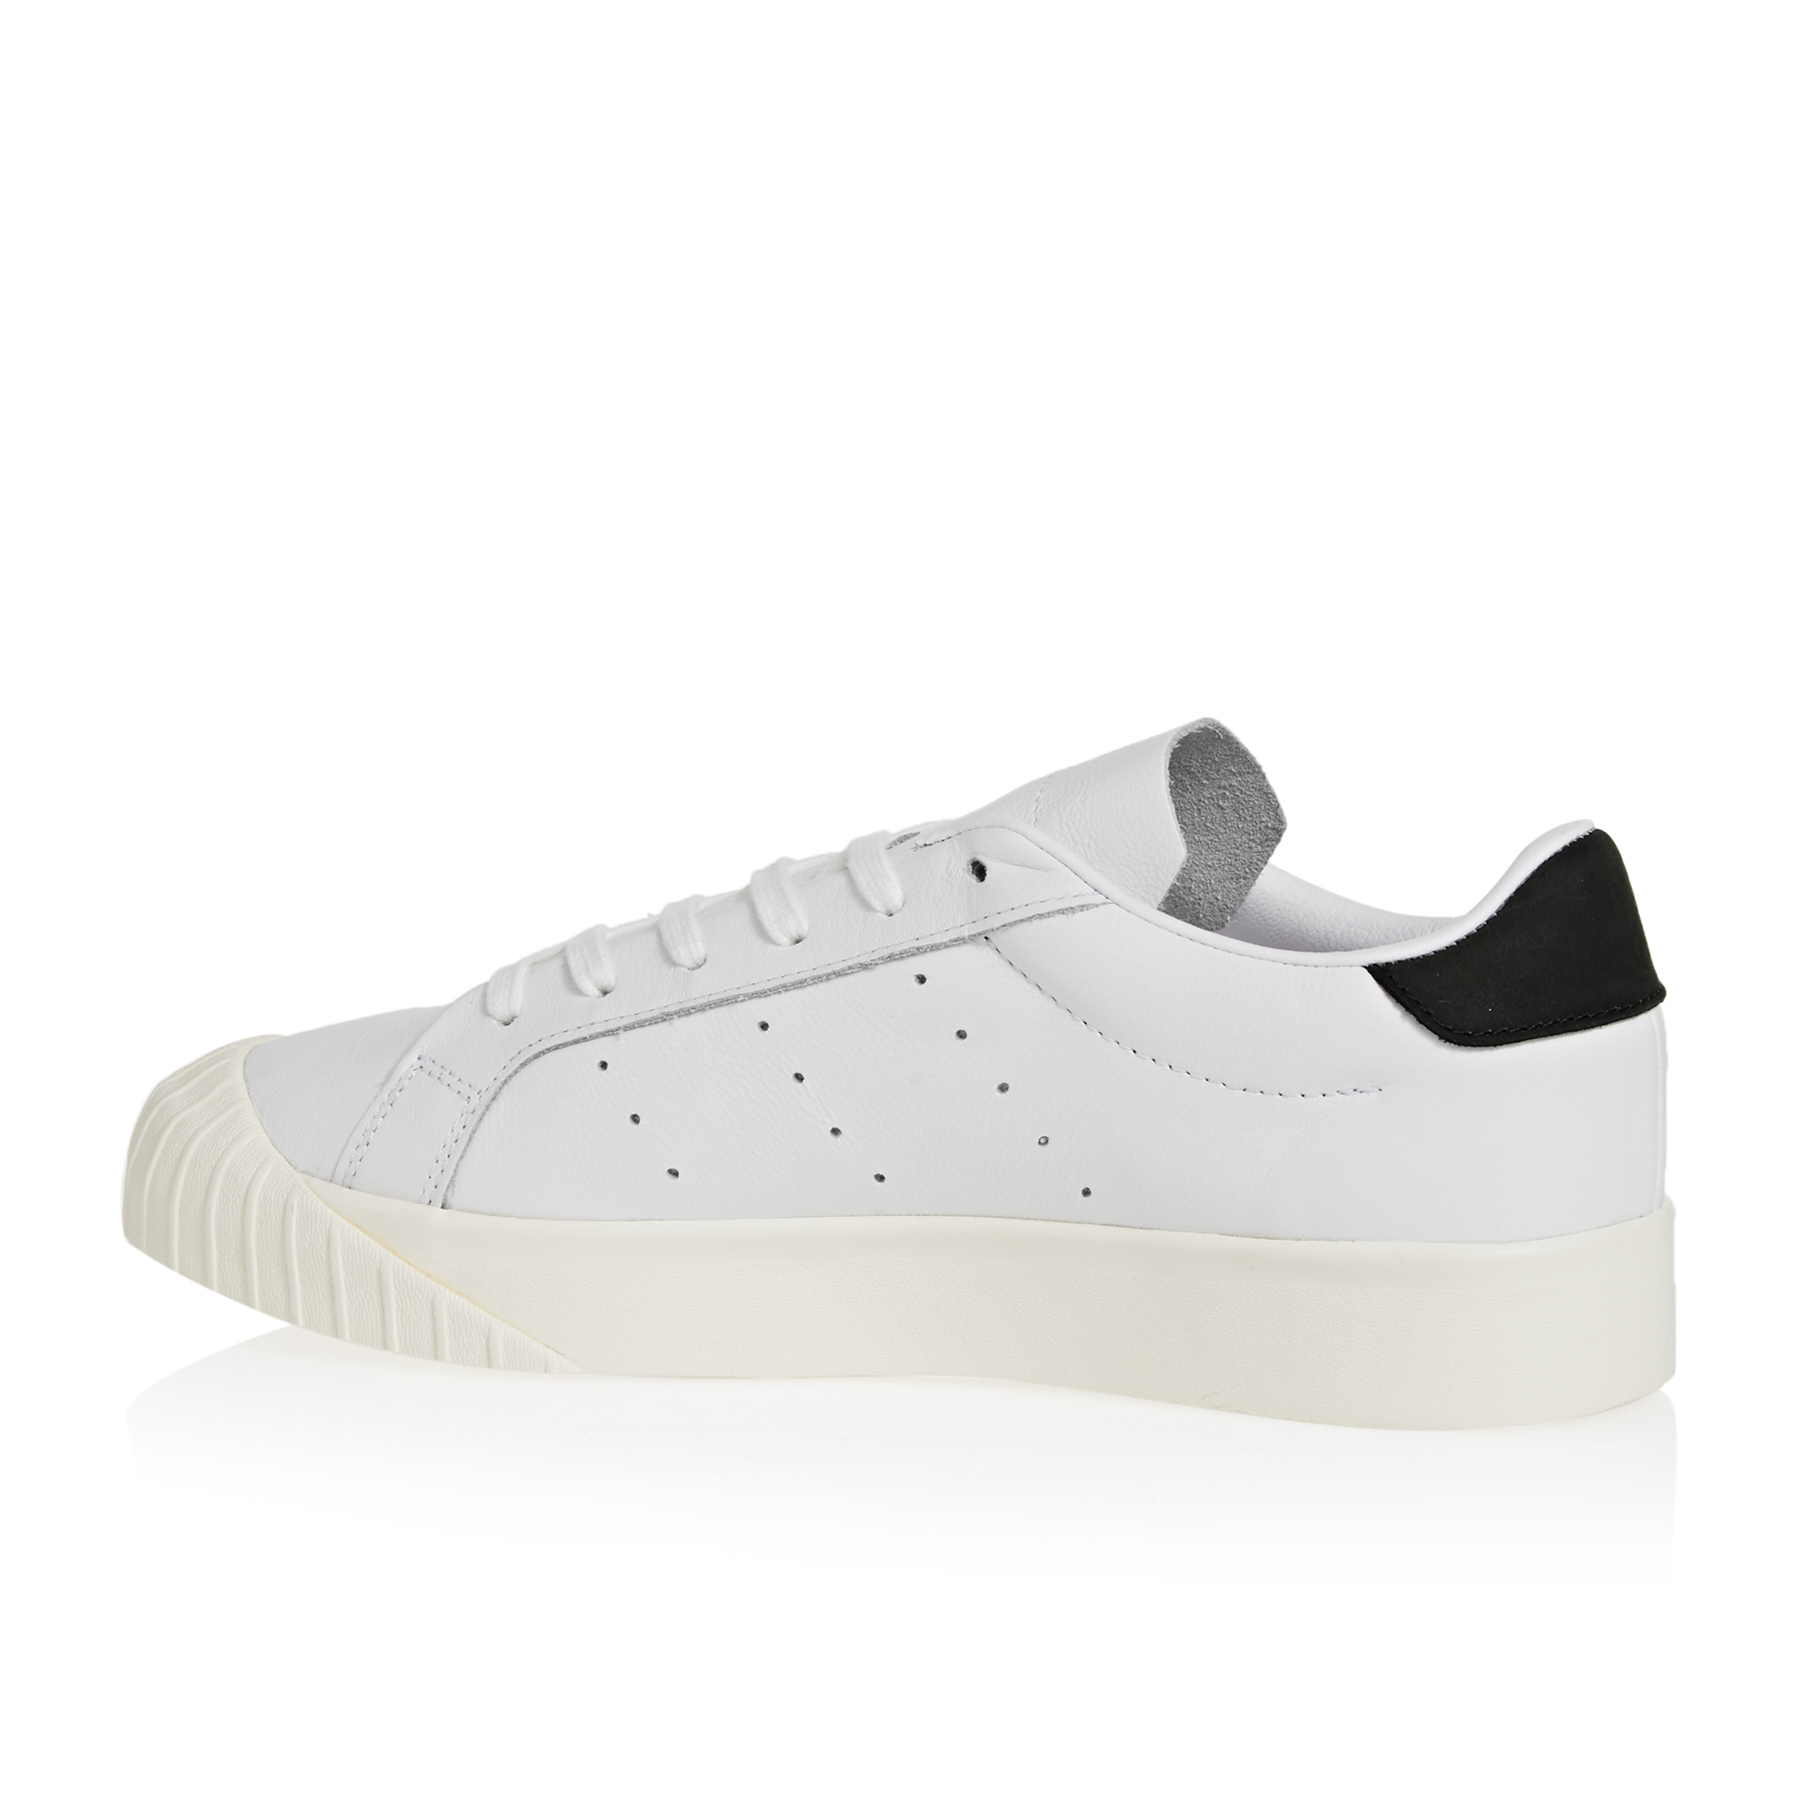 Chaussures Femme Adidas Originals Everyn | Livraison